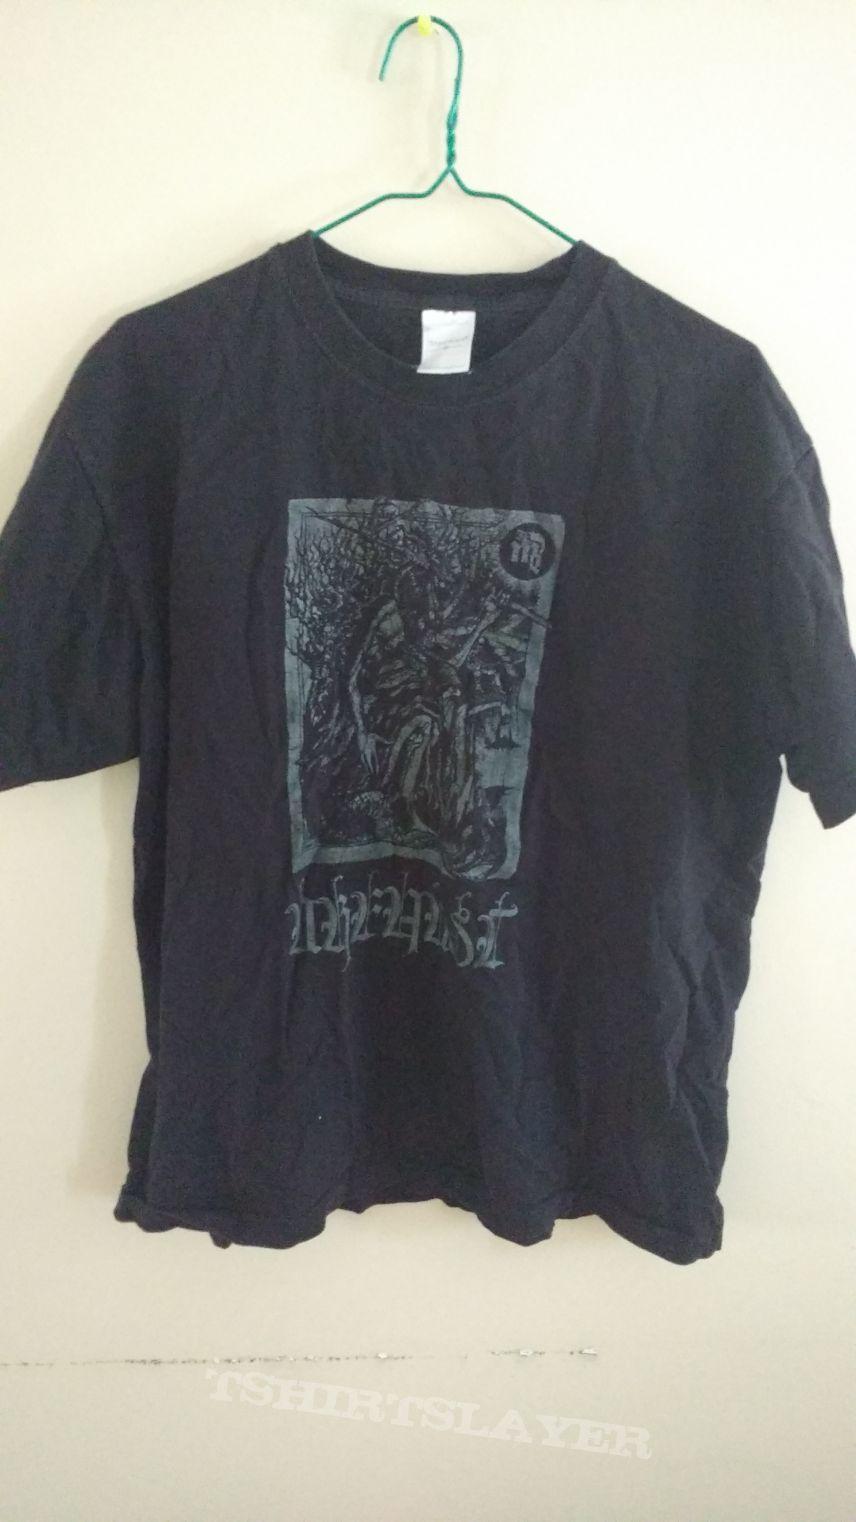 Urfaust - Einsiedler Shirt